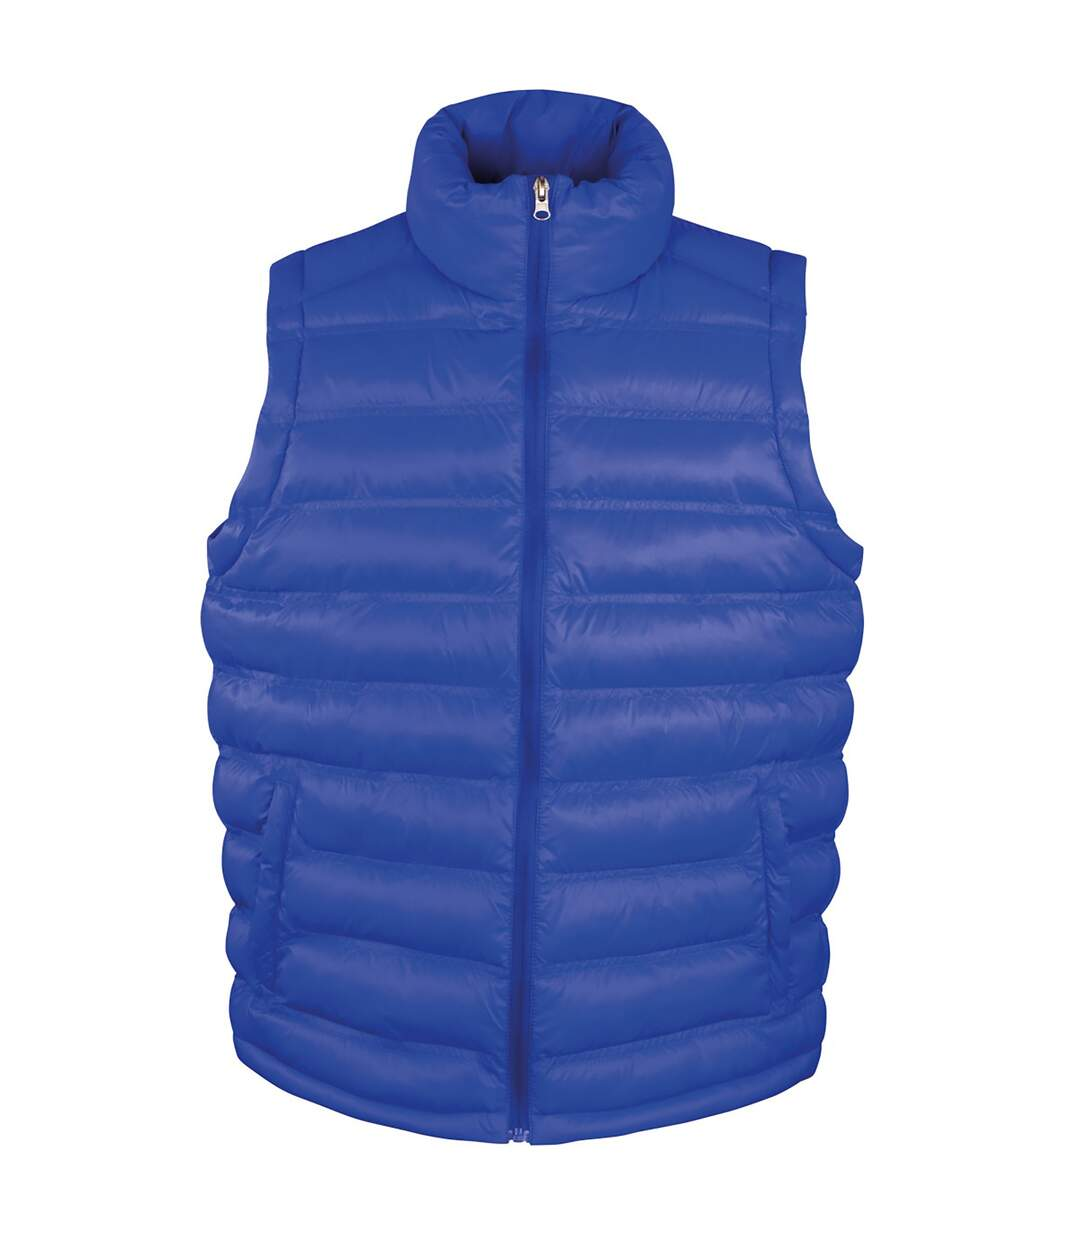 Result Mens Ice Bird Padded Bodywarmer / Gilet Jacket (Royal) - UTBC2726